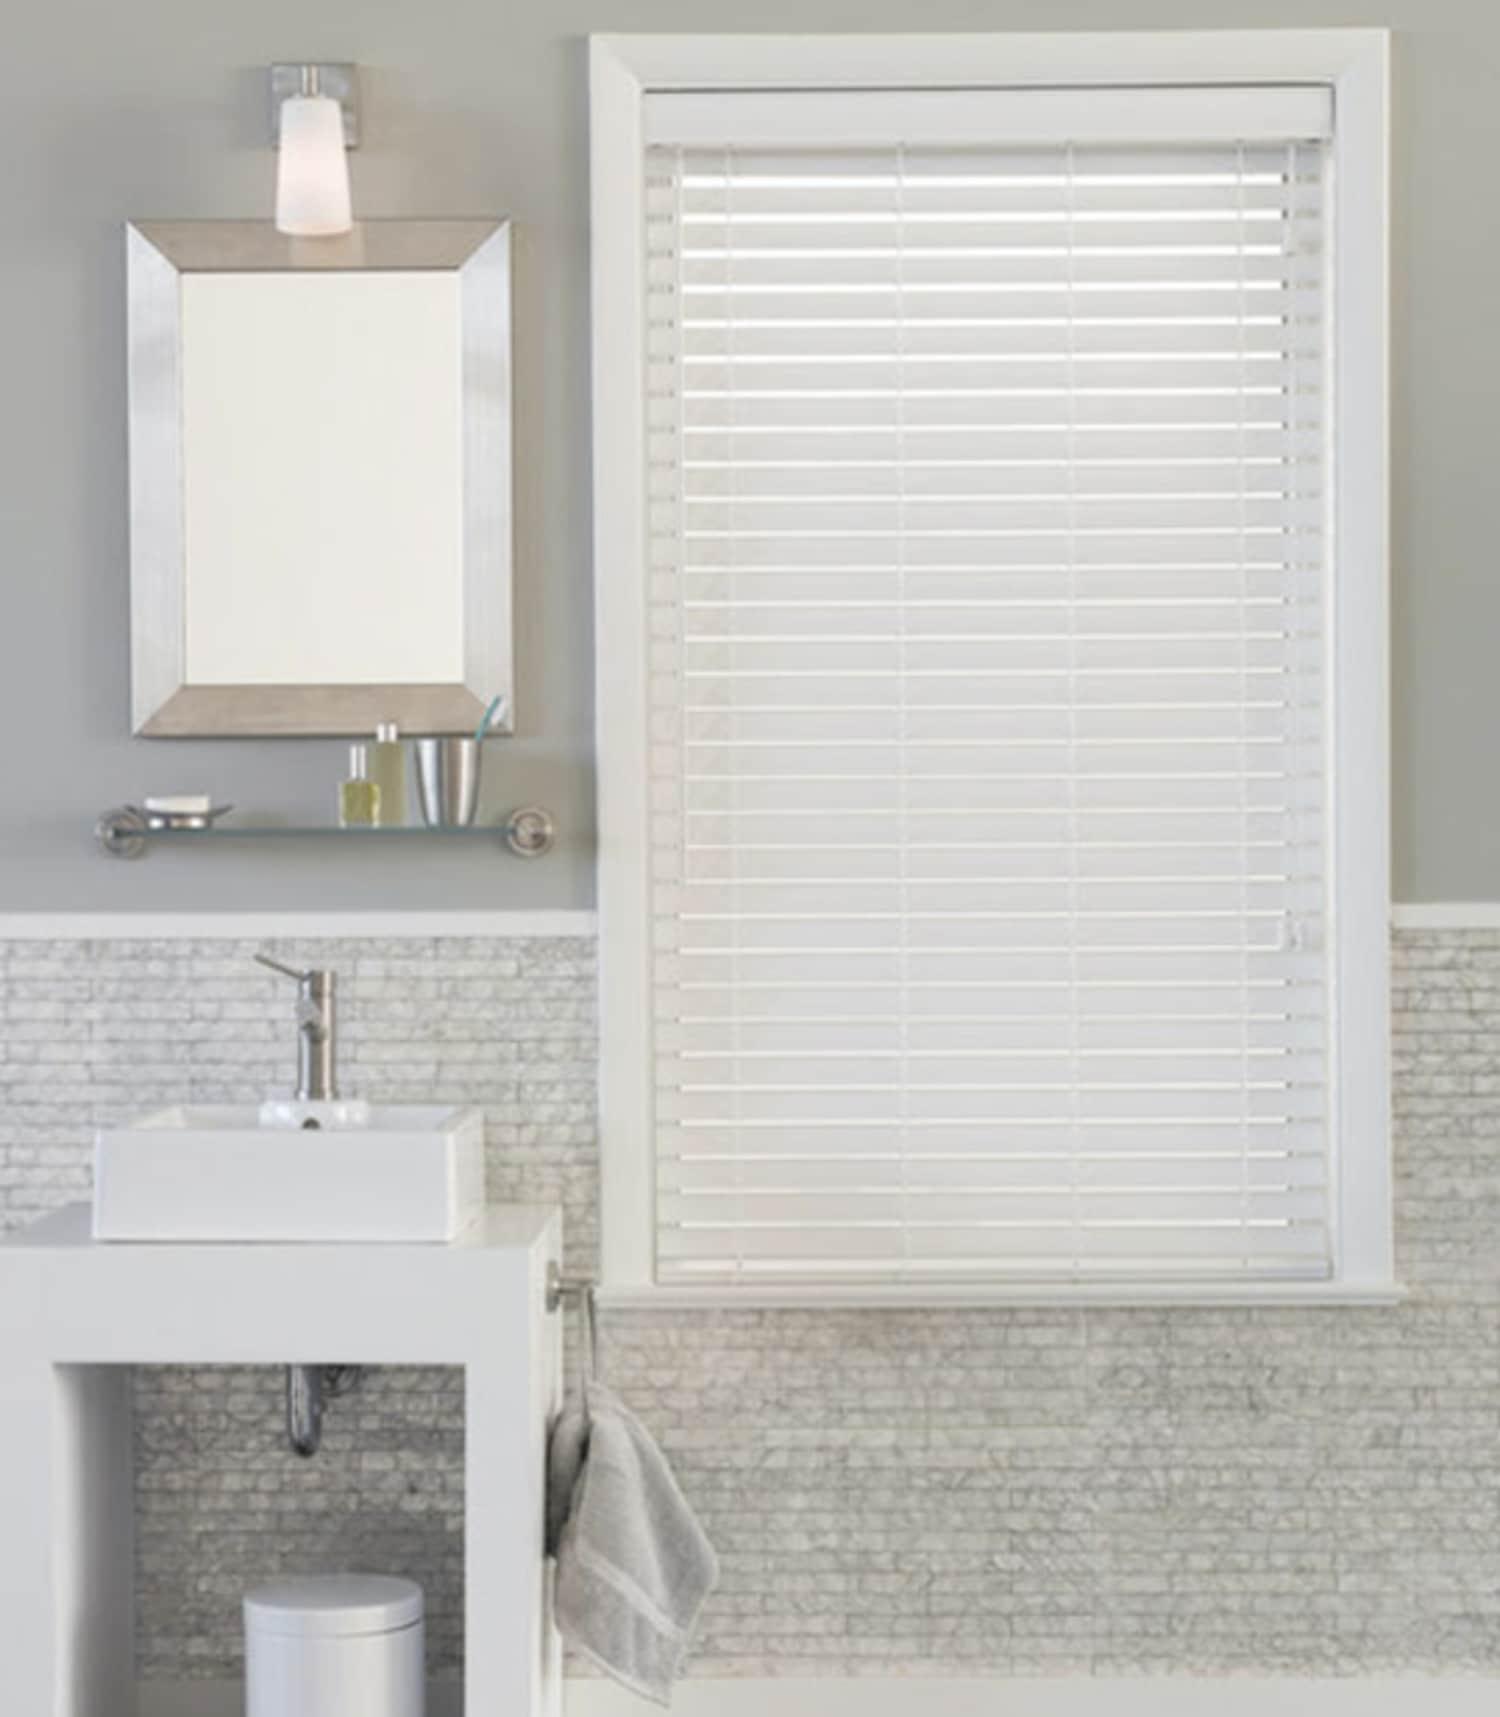 8 Solutions For Bathroom Windows